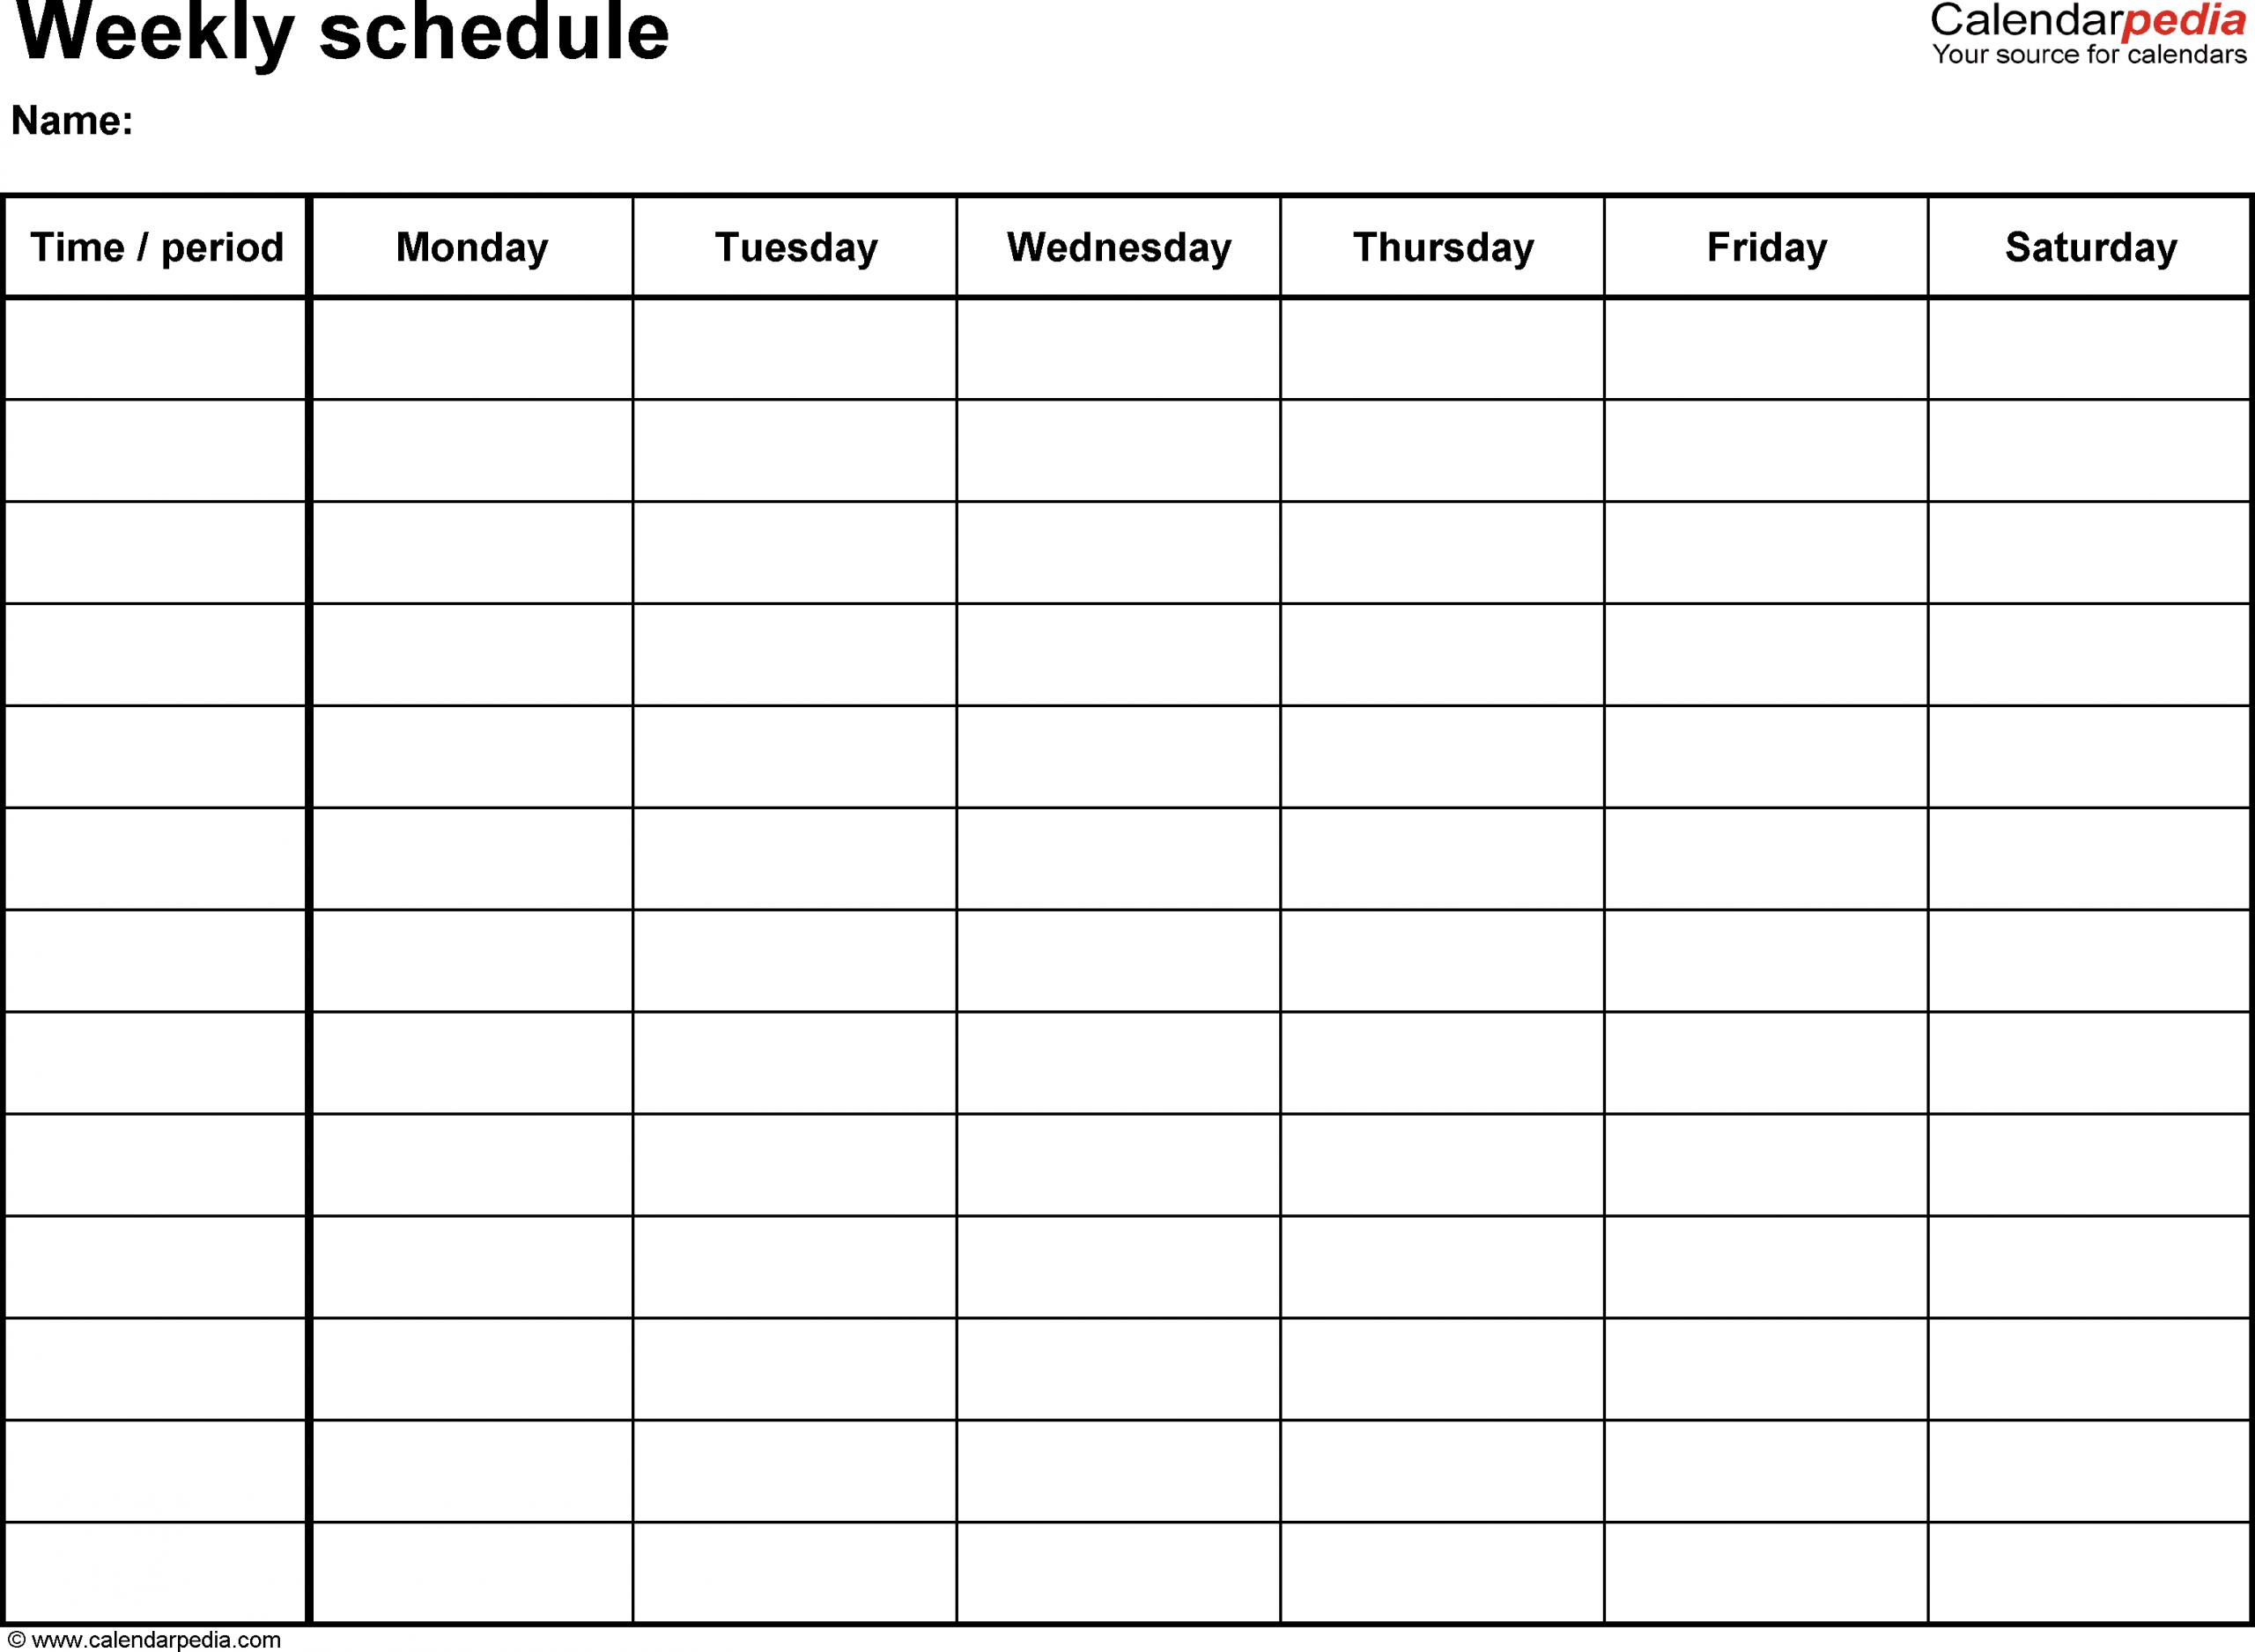 Printable Calendar Sunday Through Saturday | Calendar Free Sunday Through Saturday Scheduling Calender